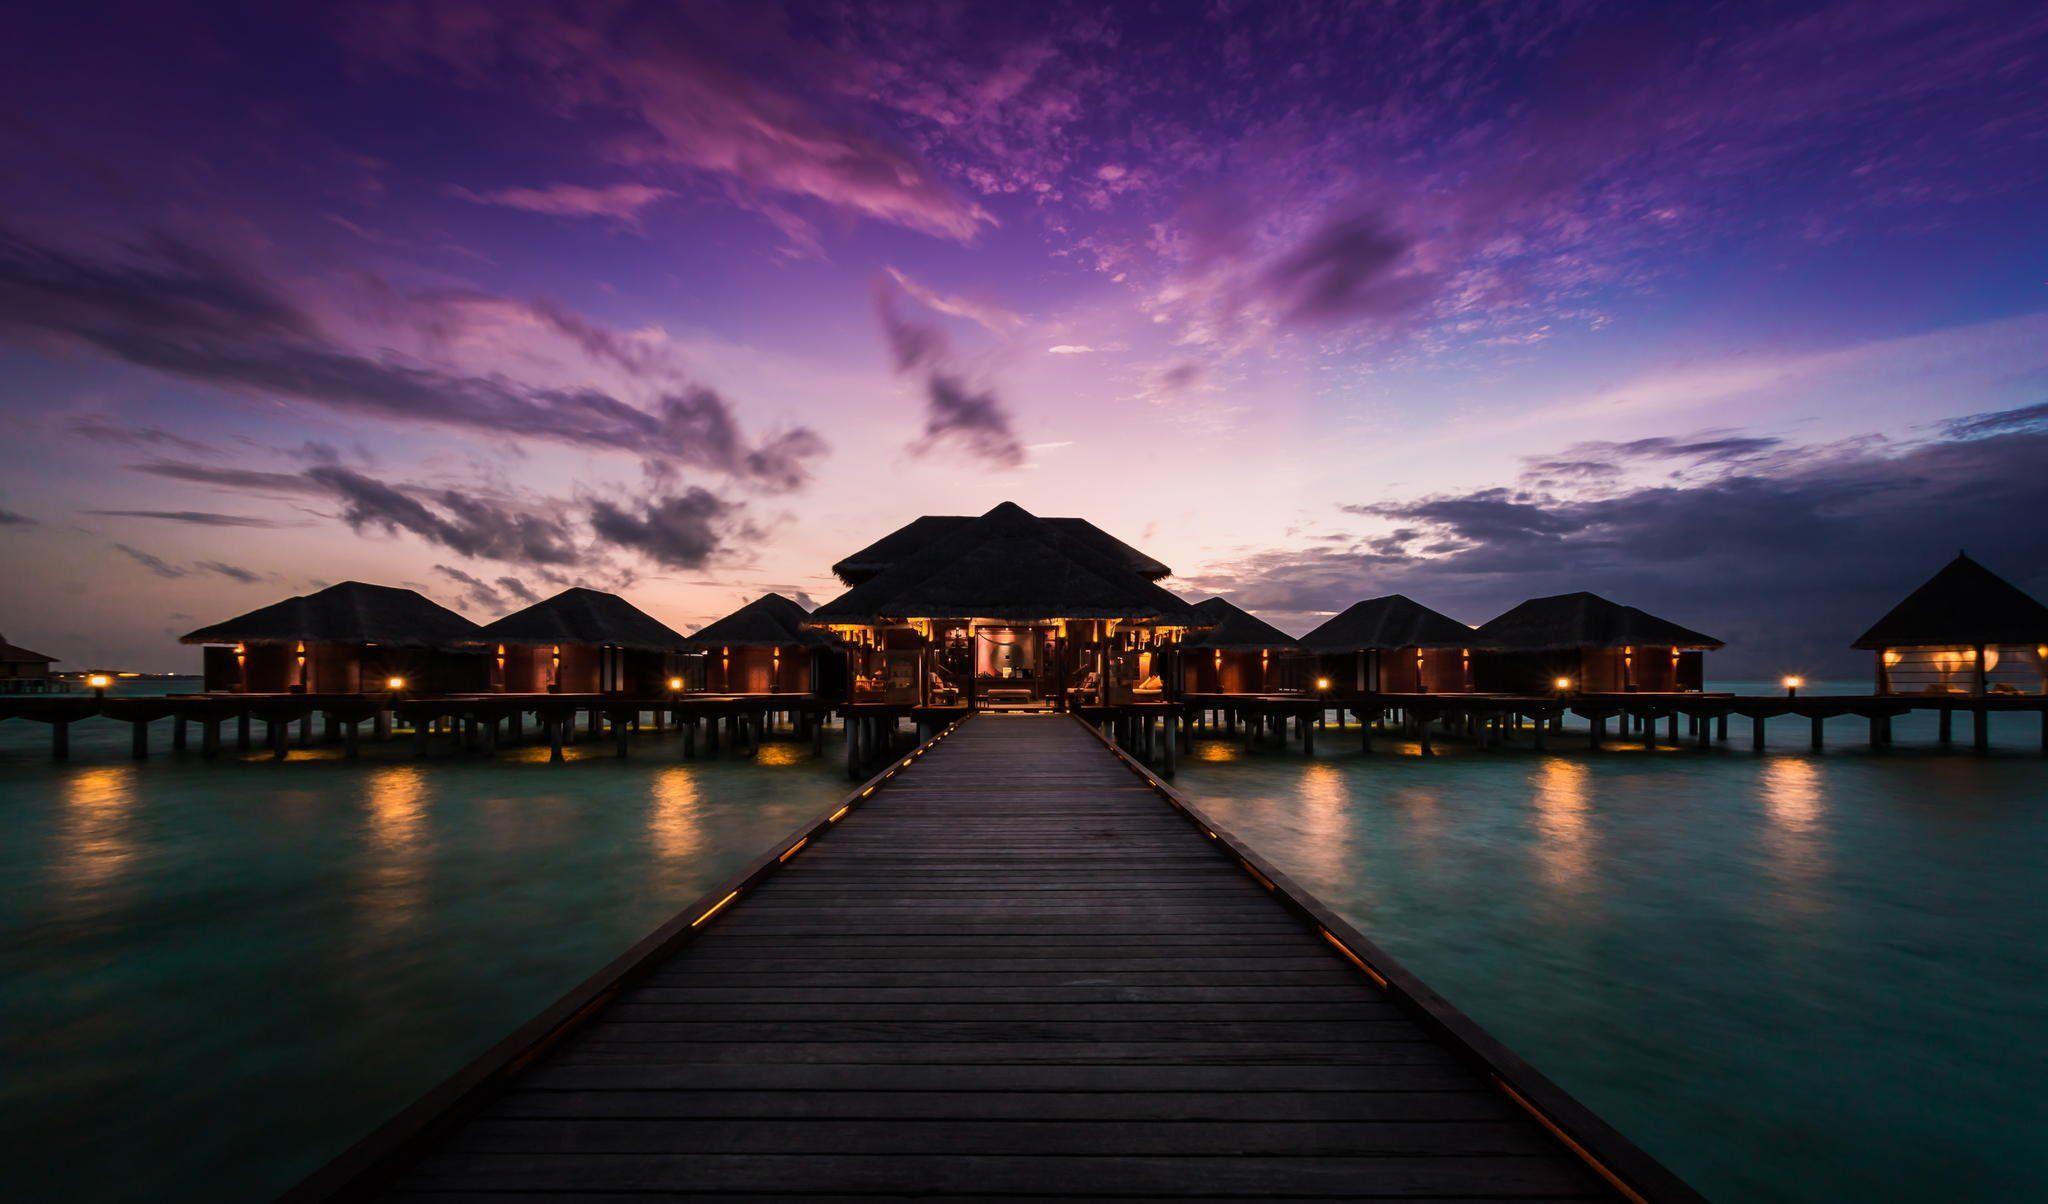 Maldives Night Wallpapers Widescreen Bozhuwallpaper